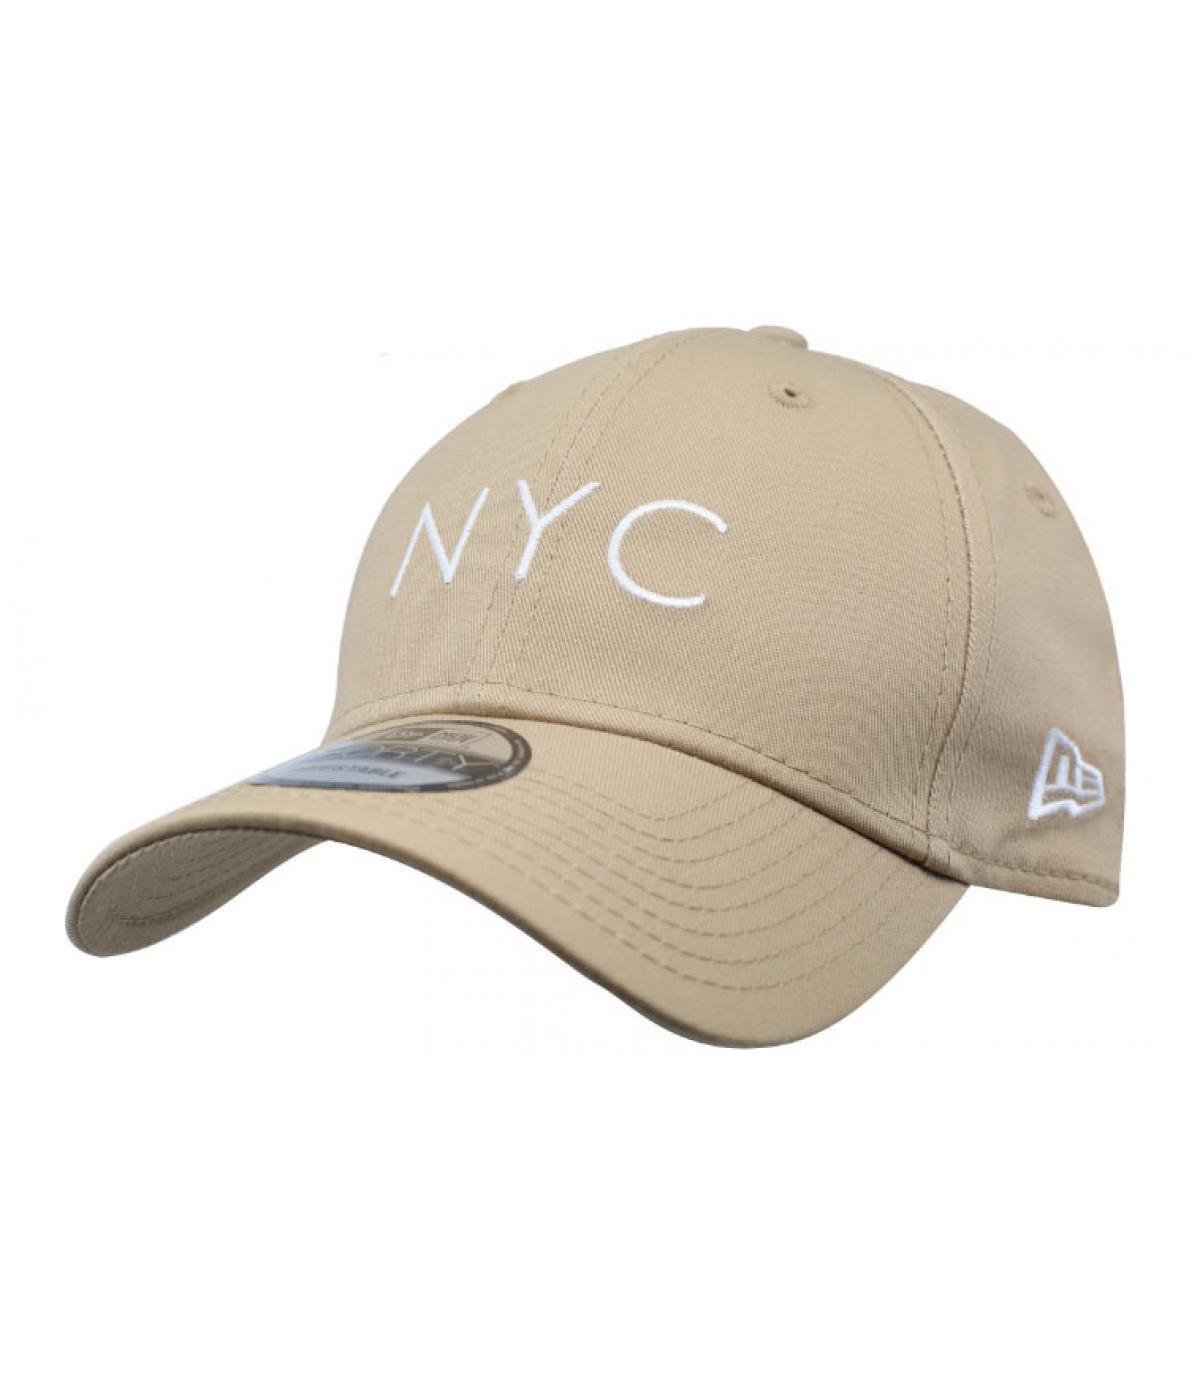 casquette NYC beige